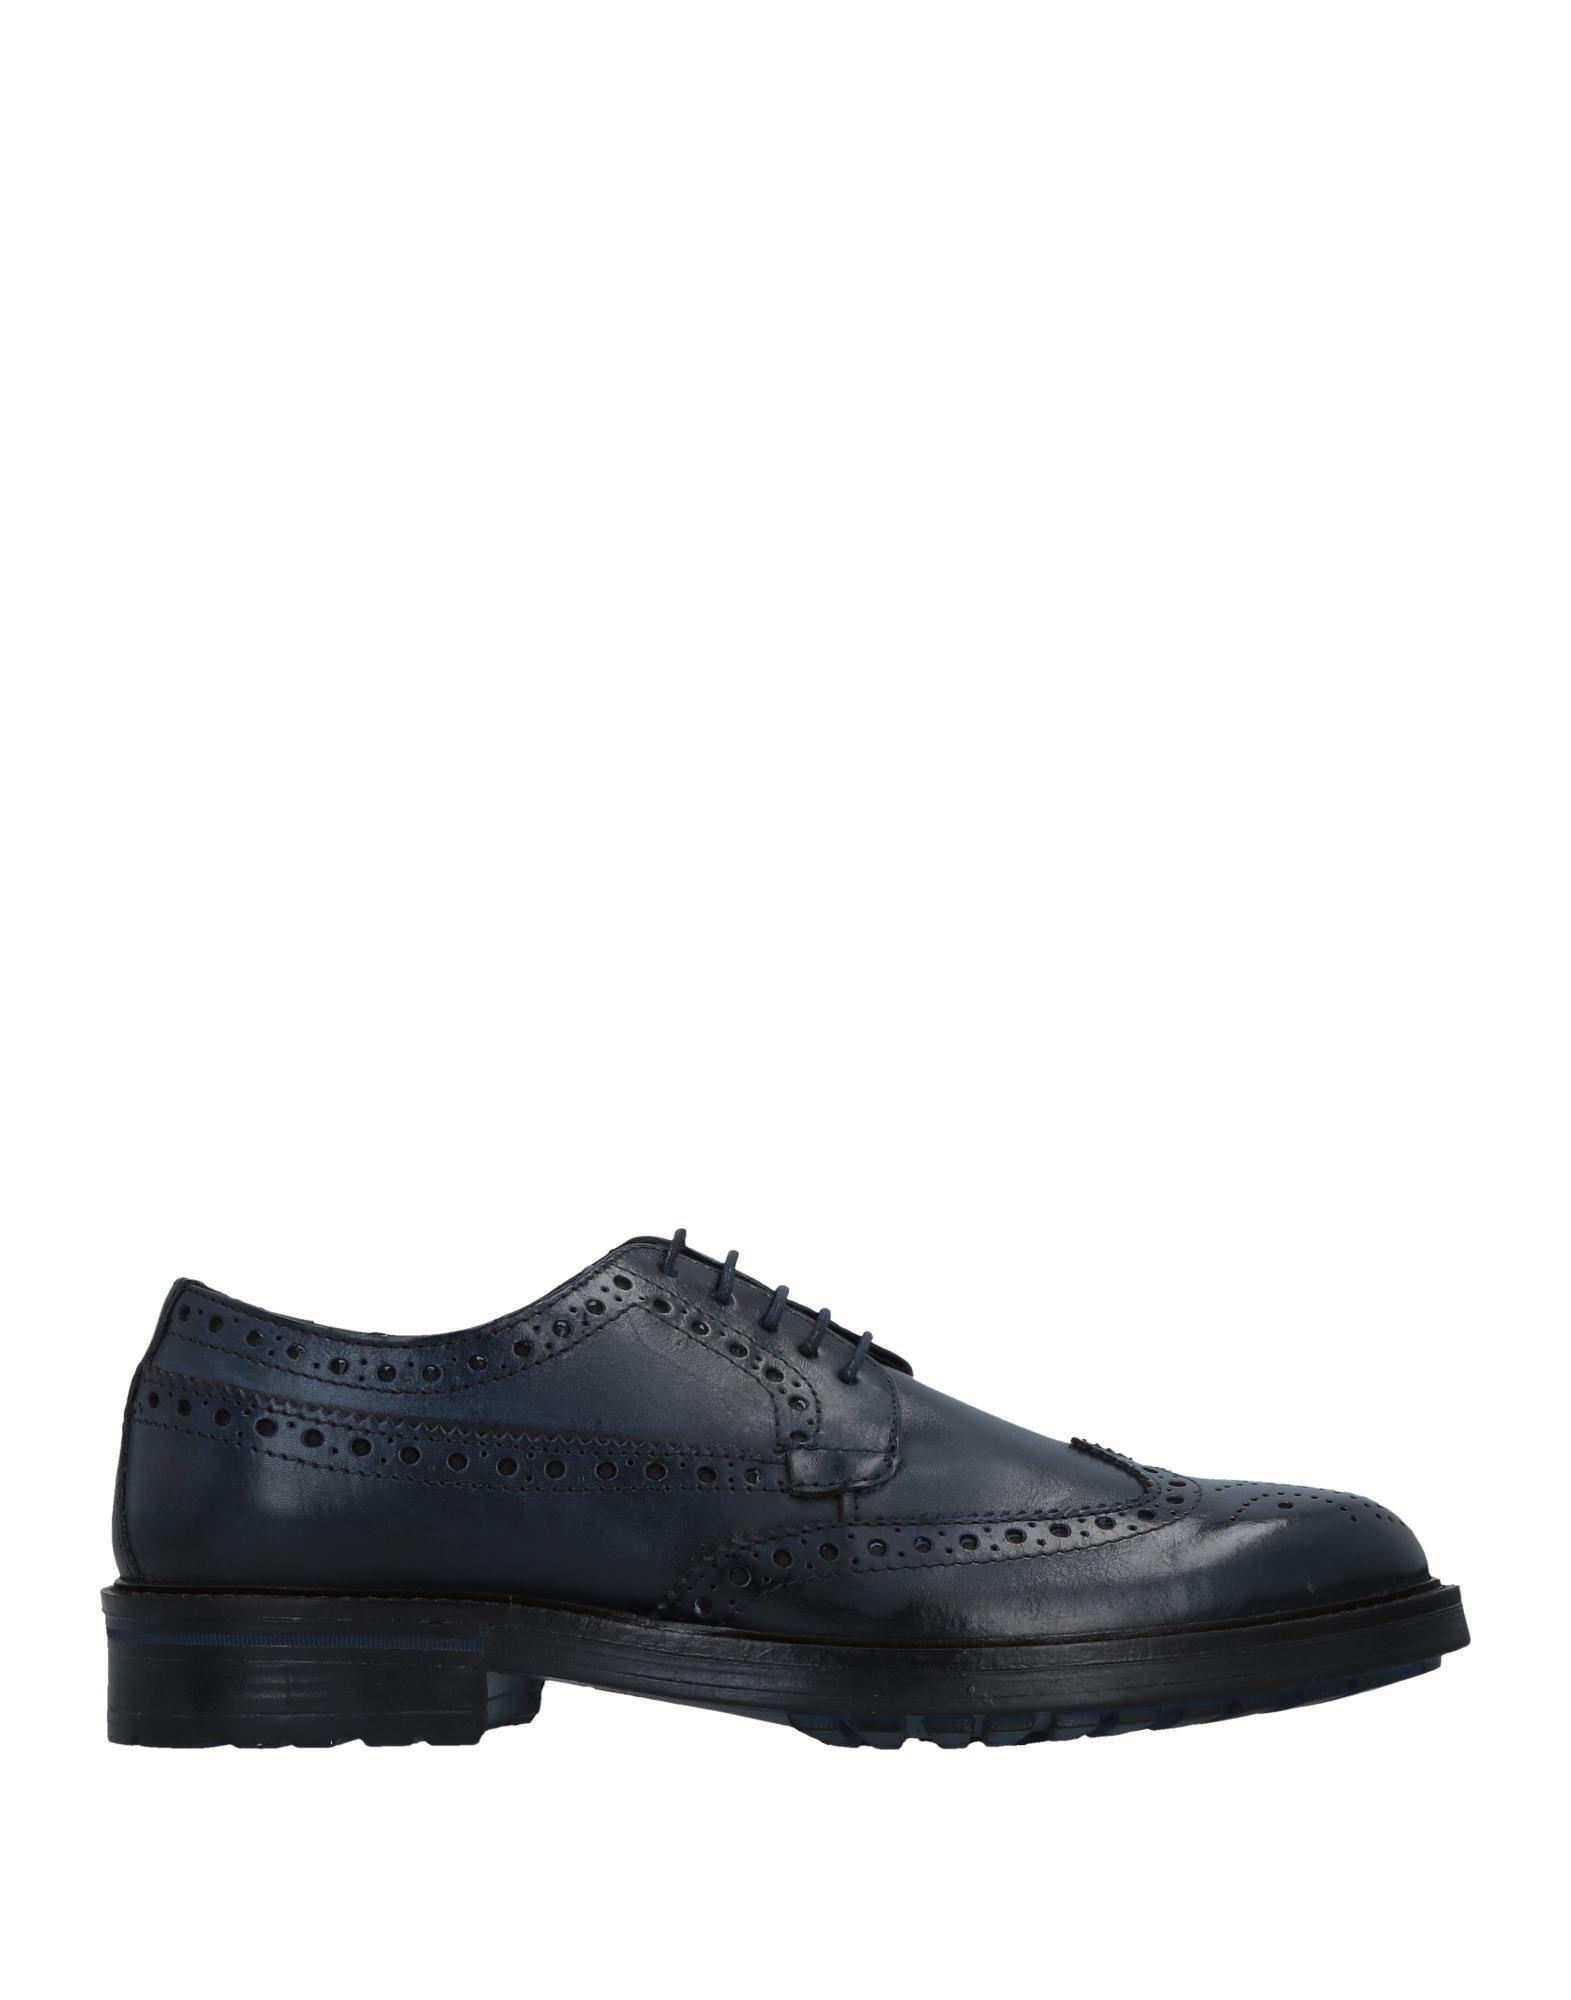 Rabatt echte  Schuhe Bagatt Schnürschuhe Herren  echte 11510504WR 2364c8